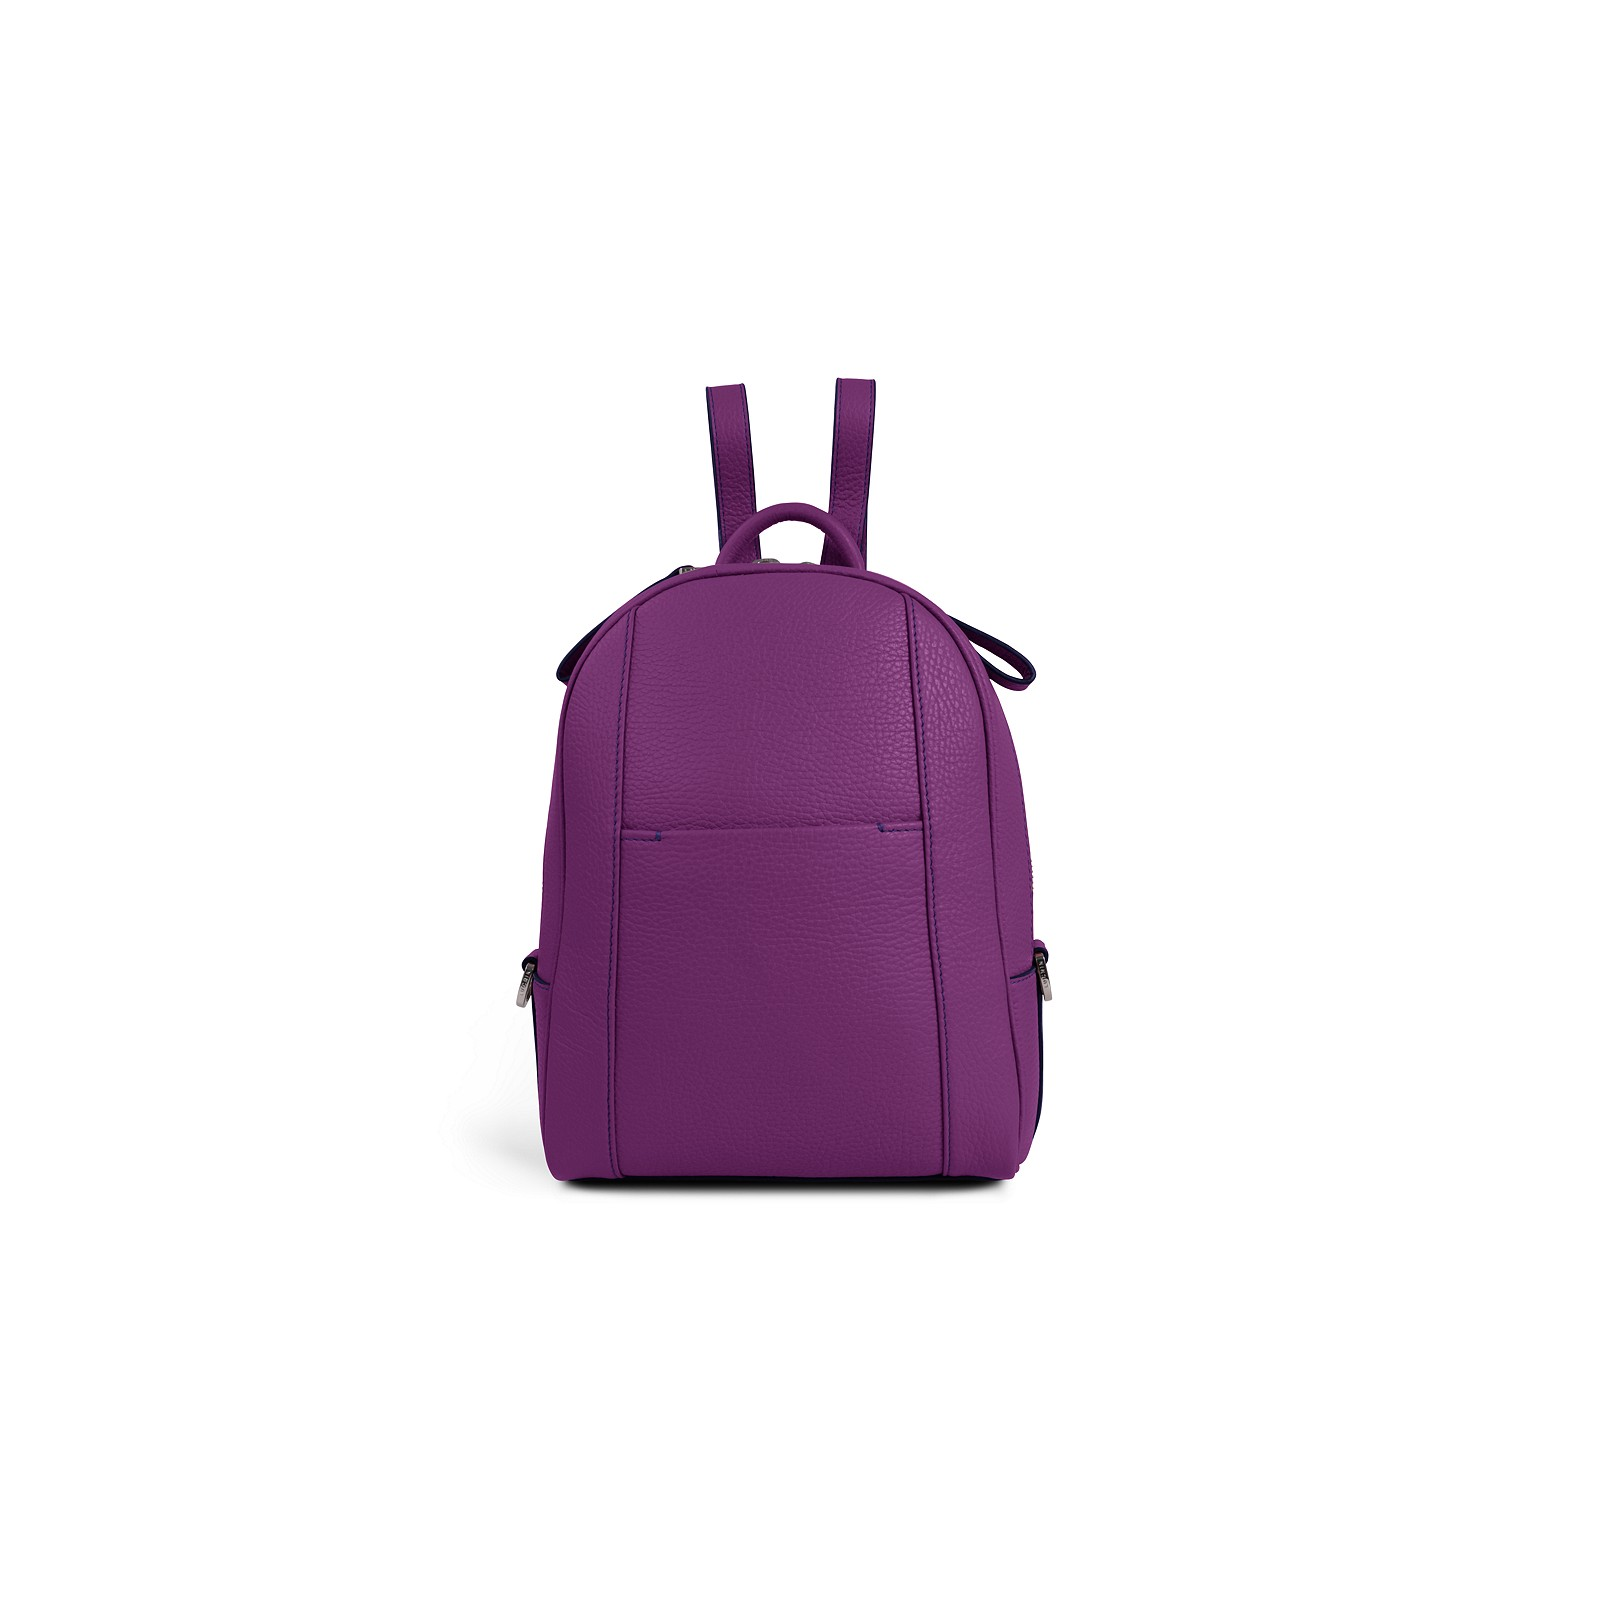 945d62b2450c Mini backpack Purple - Granulated Leather Mini backpack Purple - Granulated  Leather